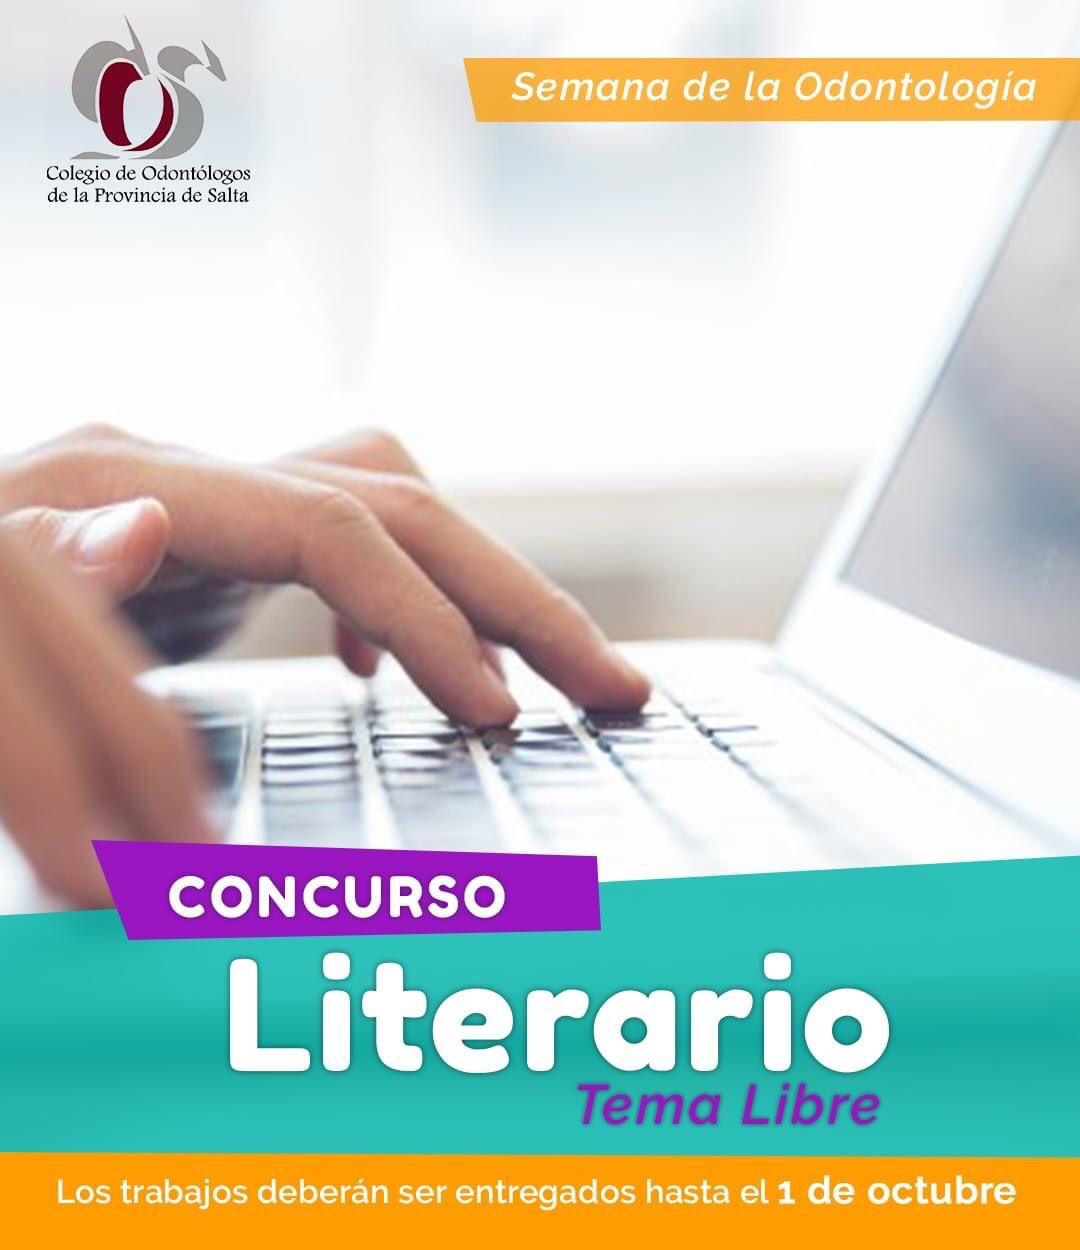 Concurso Literario 2021